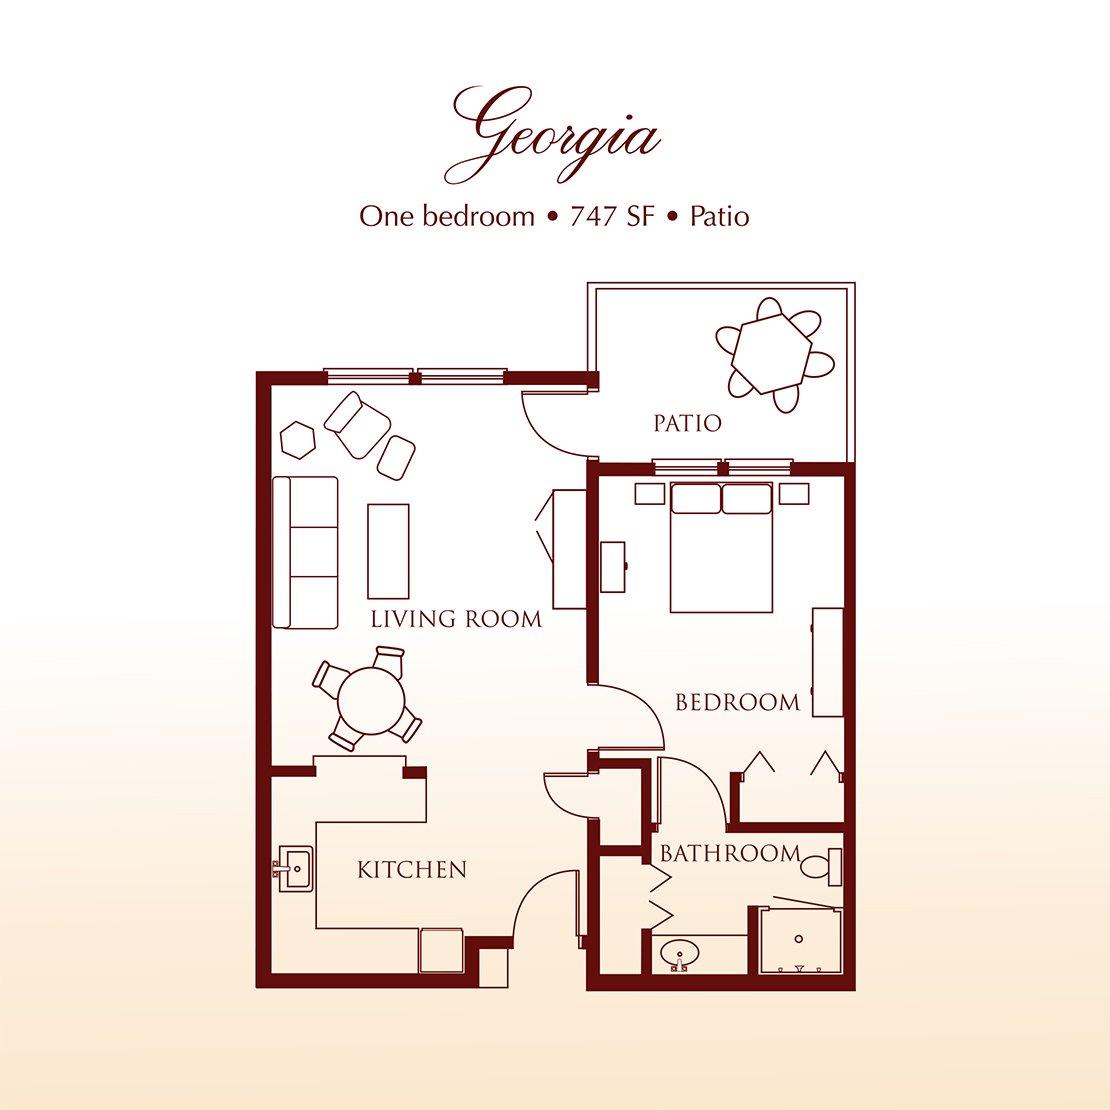 Floor plan - The Georgia One Bedroom Suite at Detray's Colonial Inn